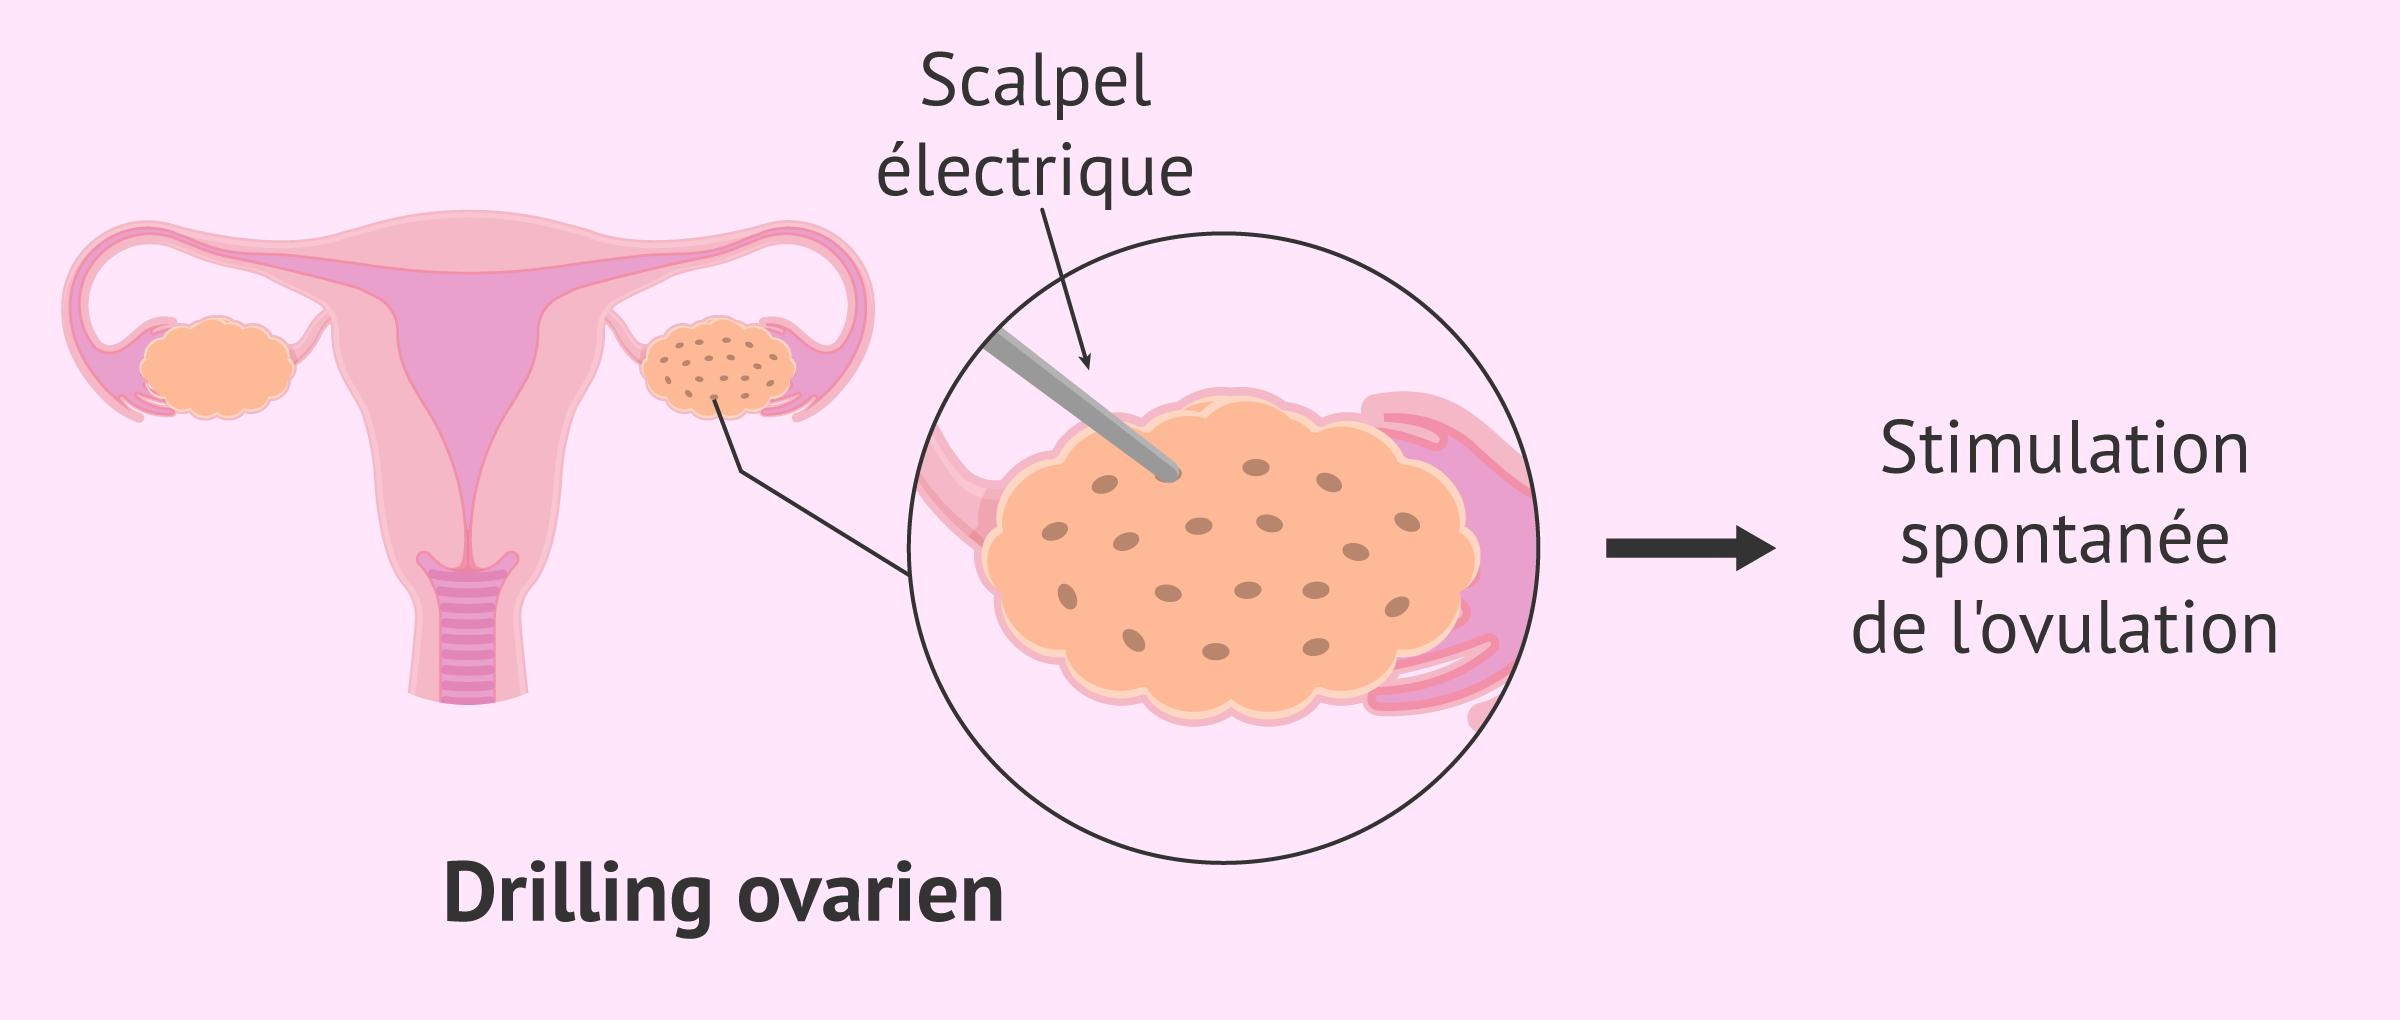 Drilling ovarien pour perforer l'ovaire